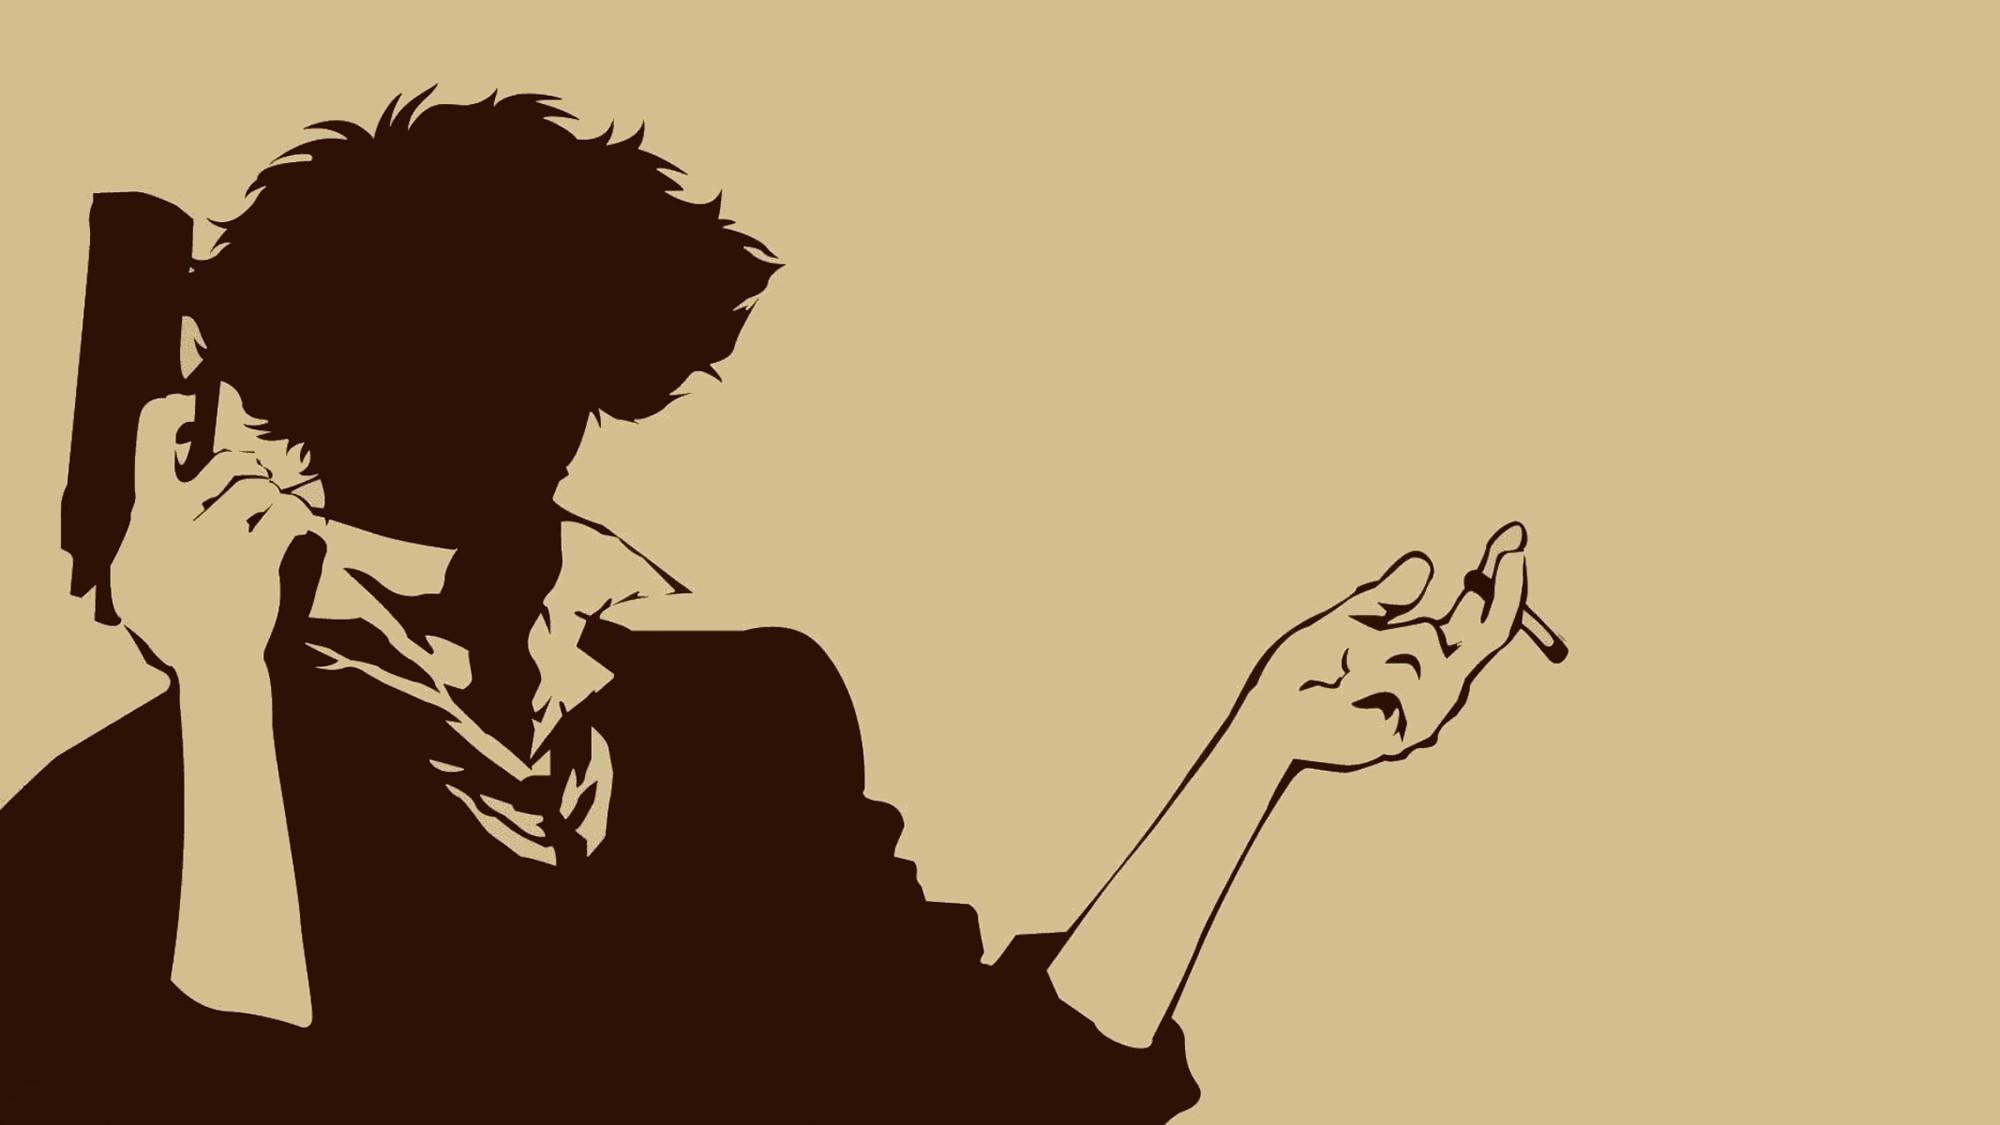 Anime Emo Boy Wallpaper Cowboy Bebop Spike Spiegel Anime Vectors Wallpapers Hd